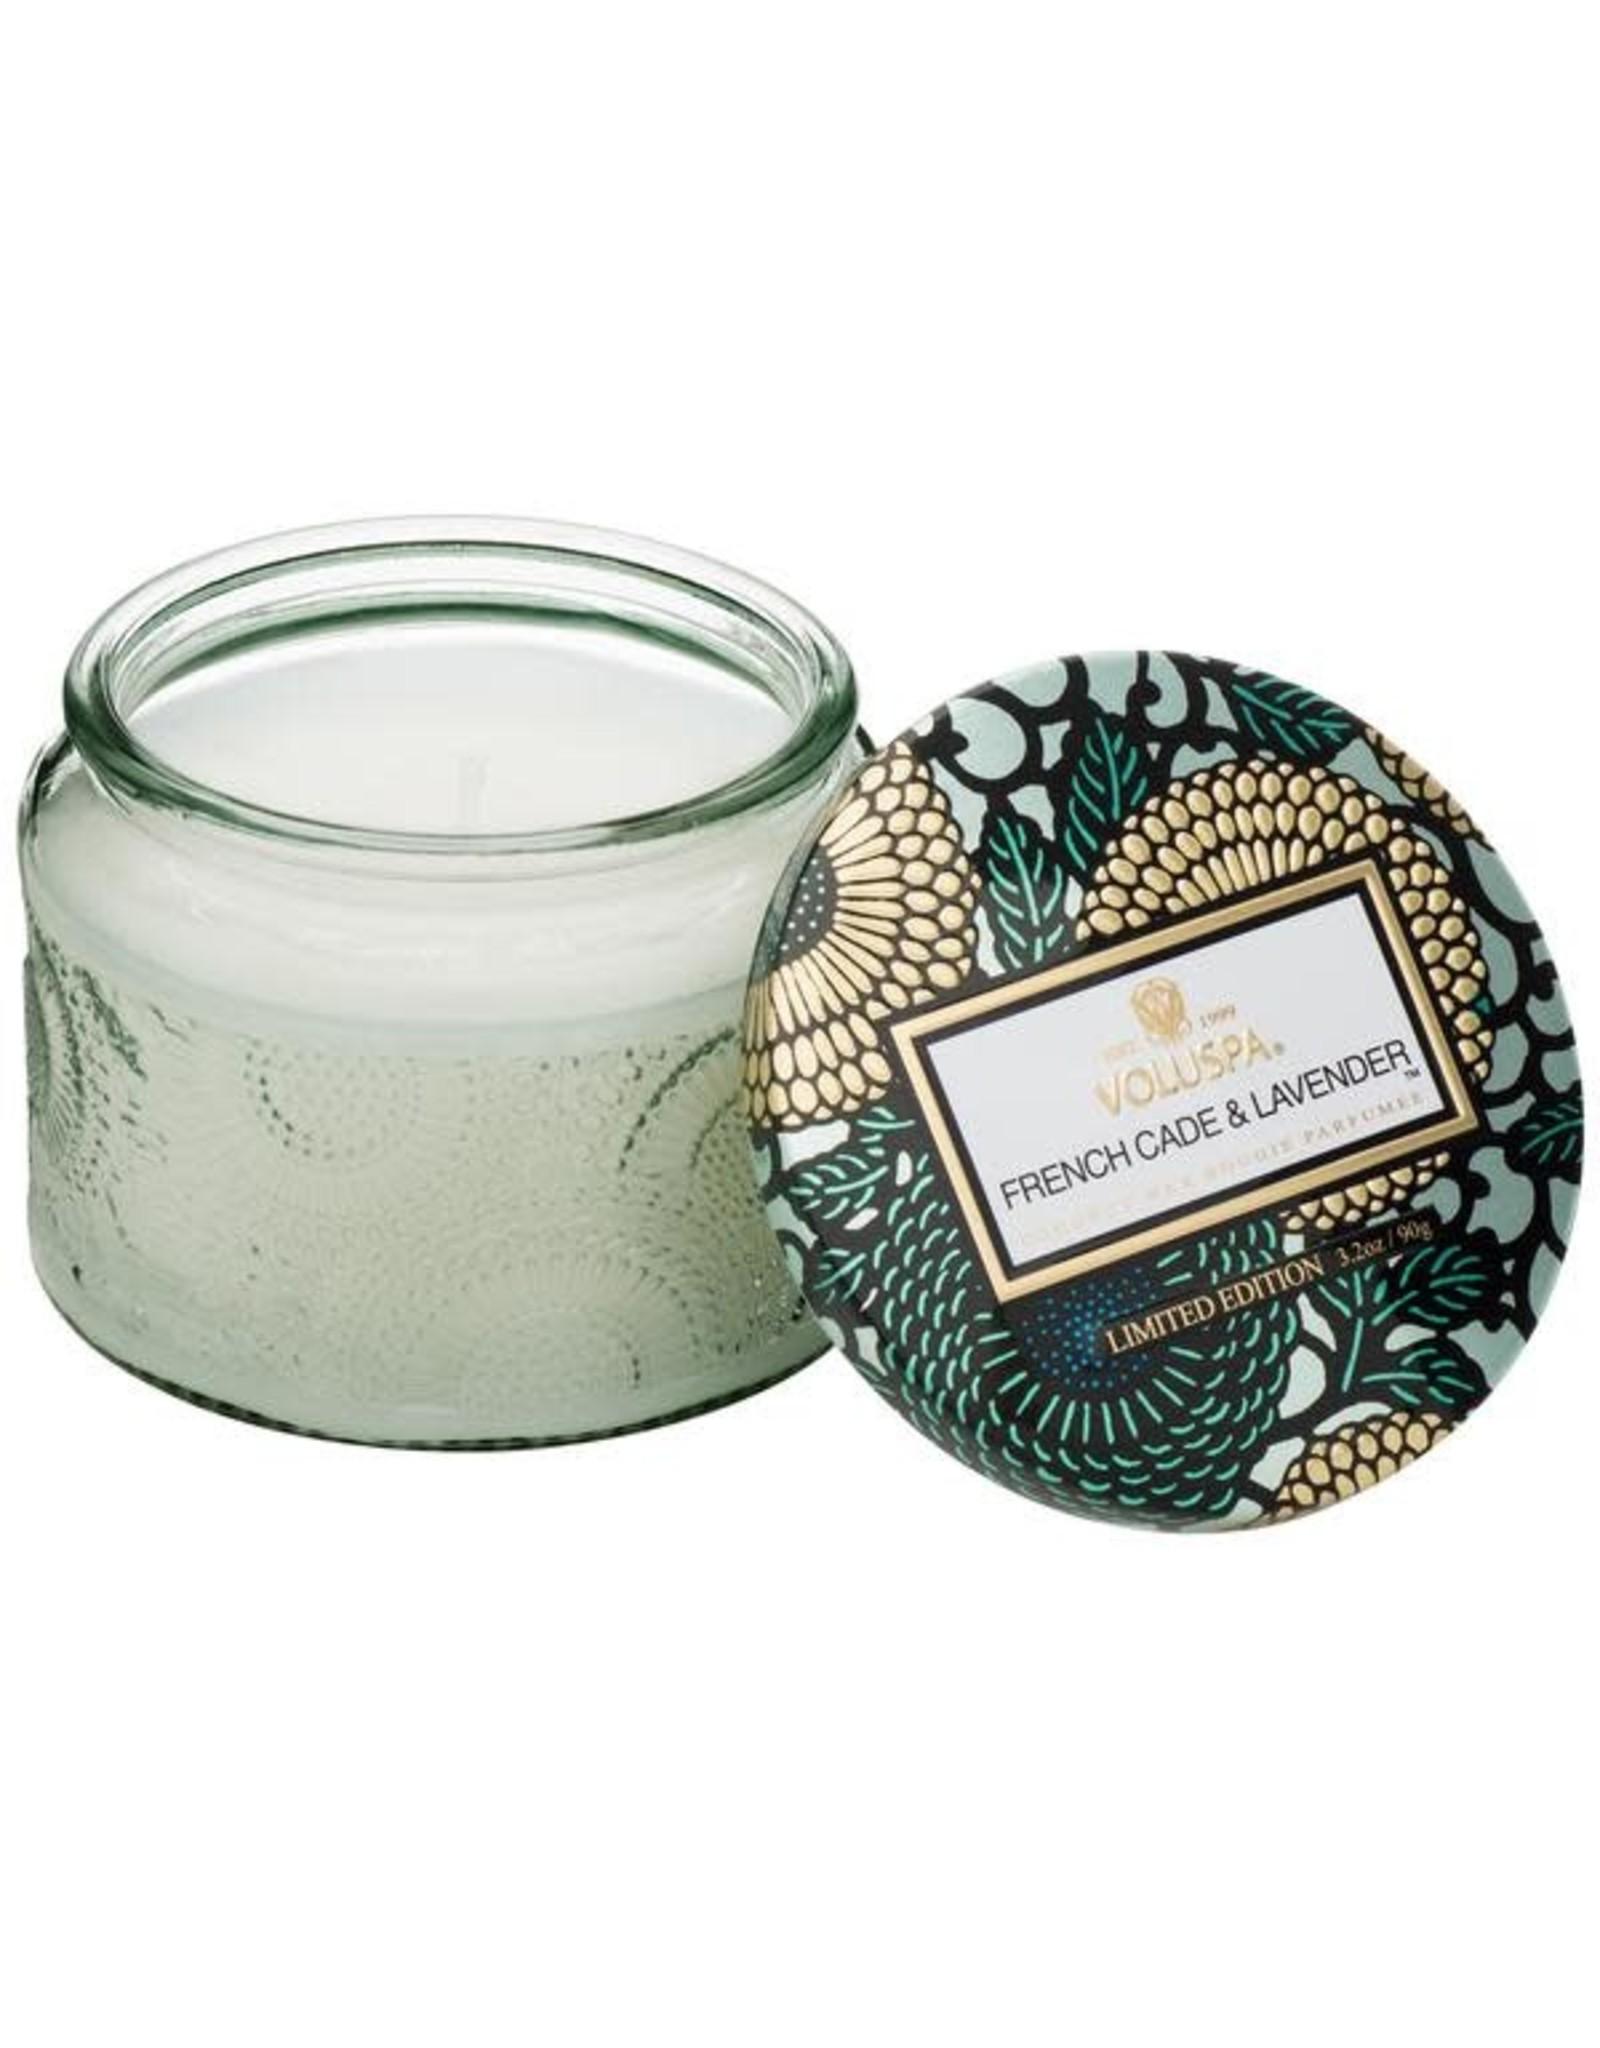 Voluspa Voluspa Small Glass Jar Candle